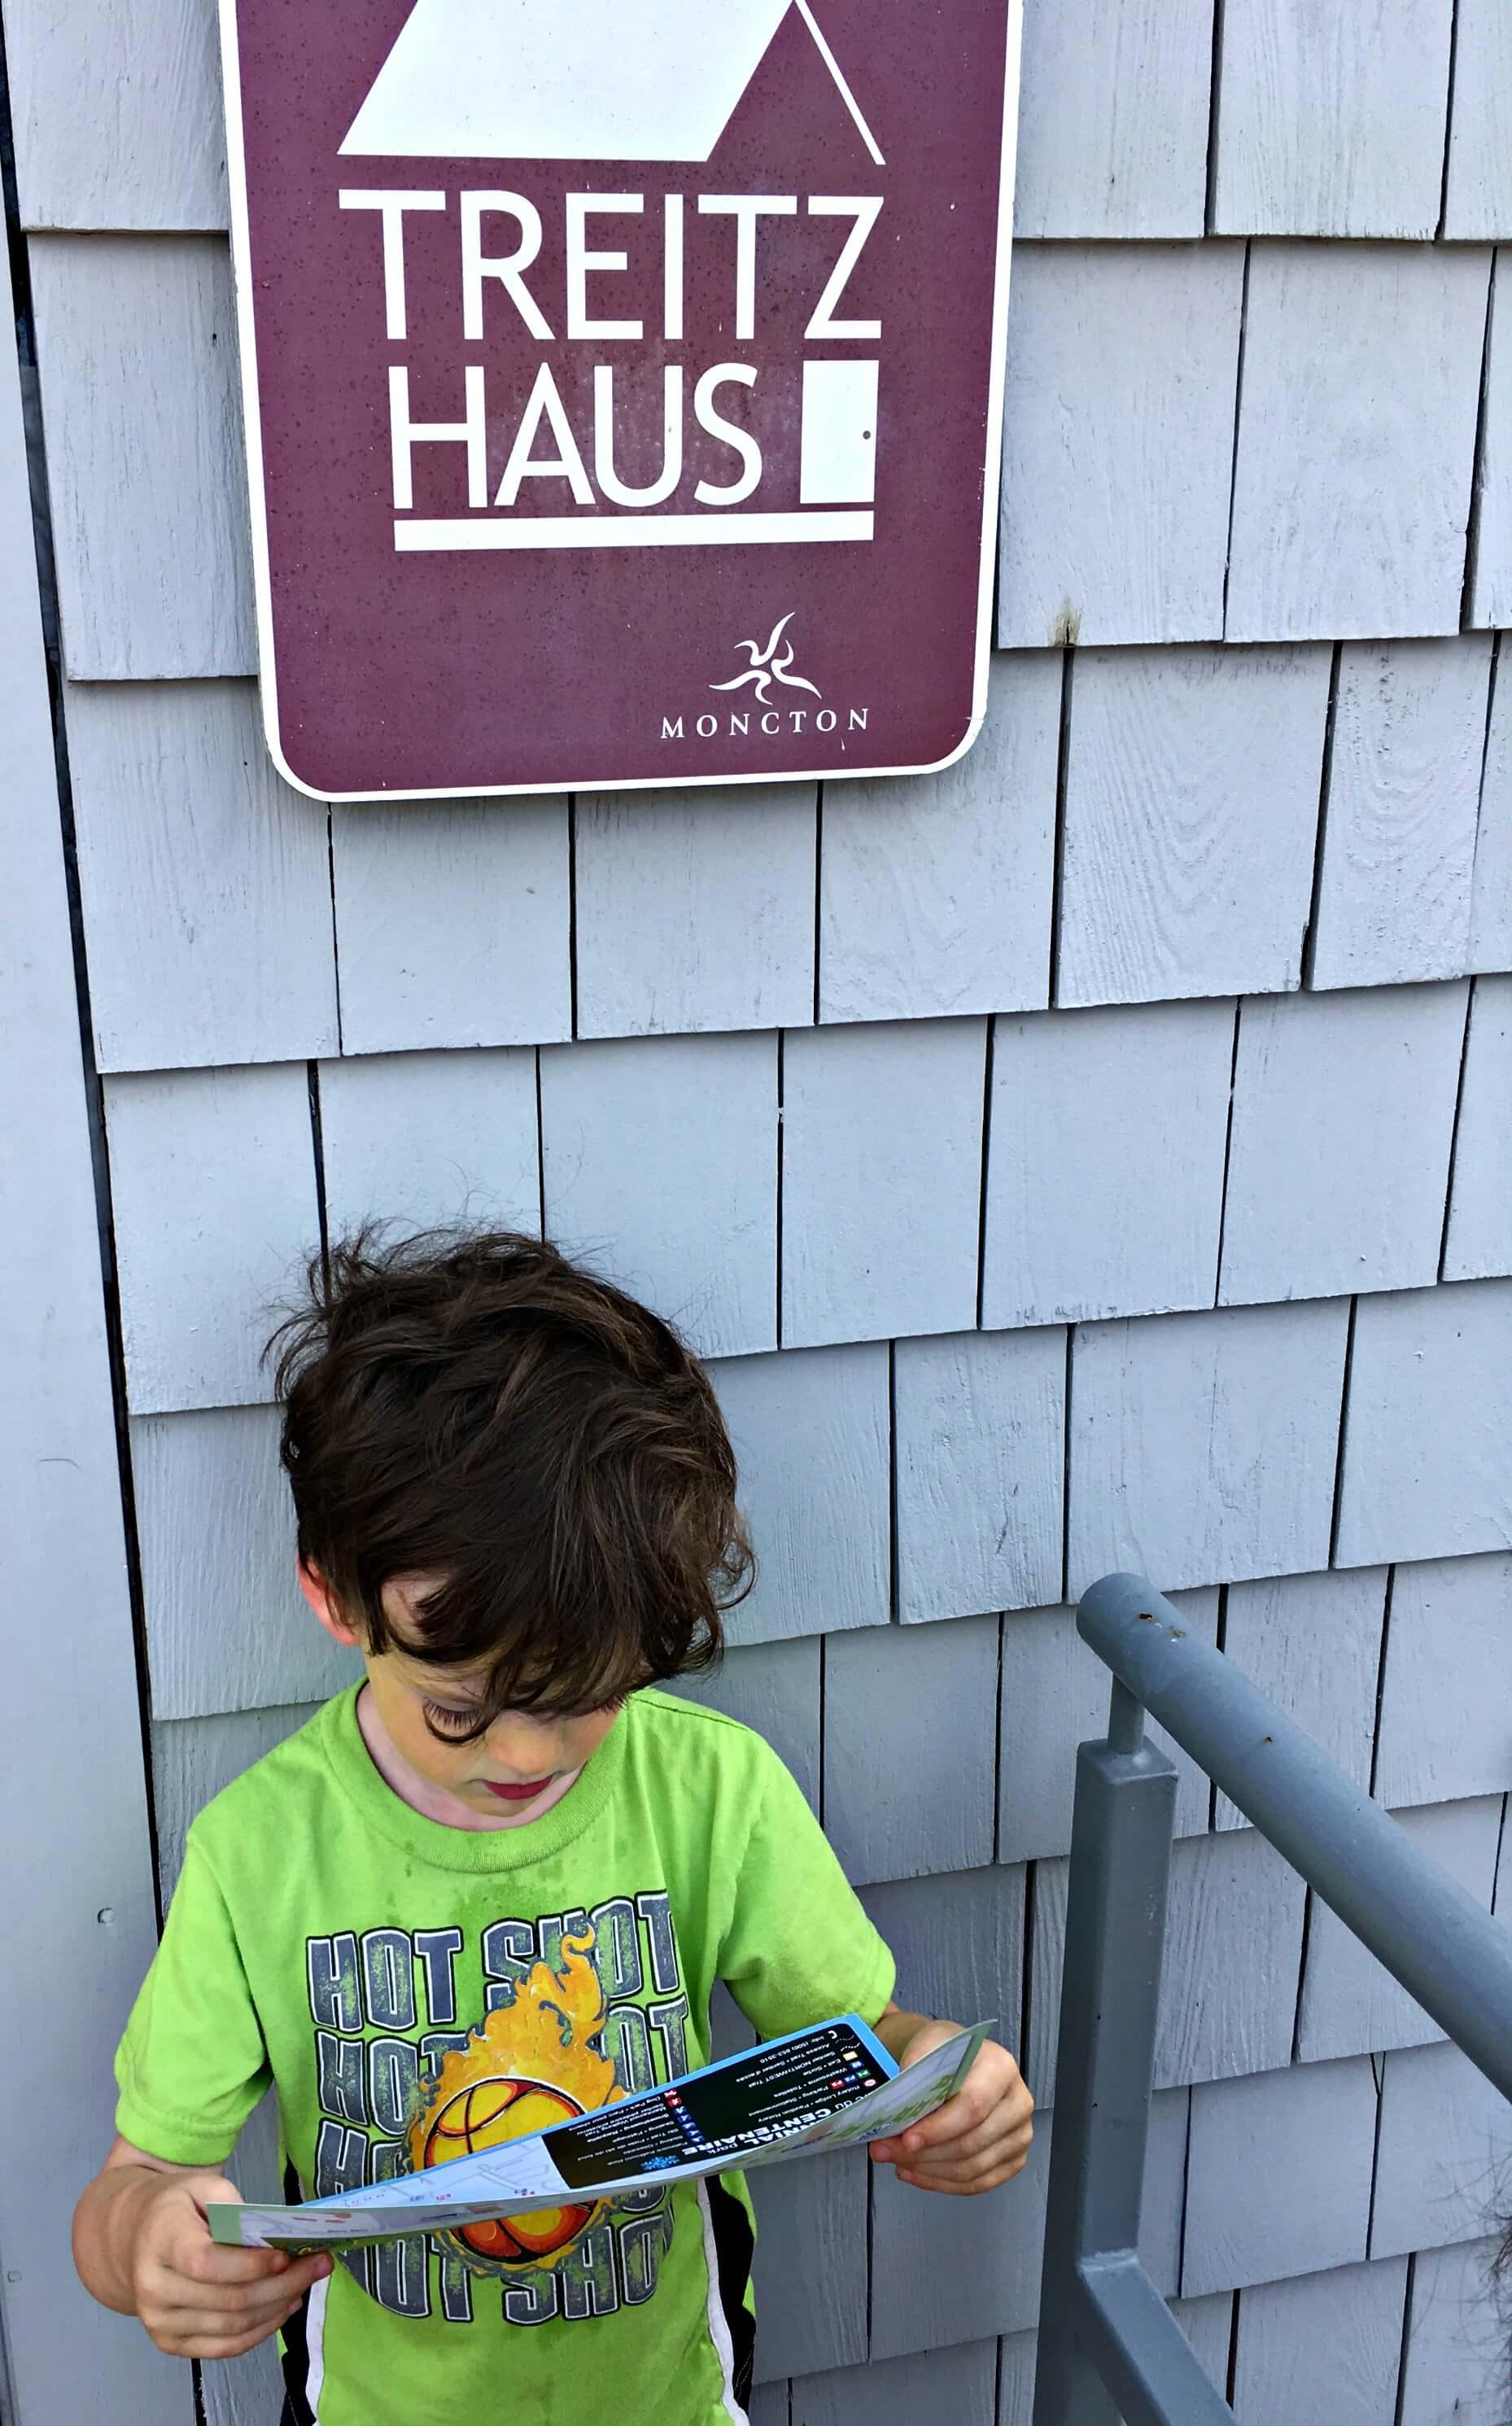 free things moncton kids family treitz haus trites house information centre maps pickle planet